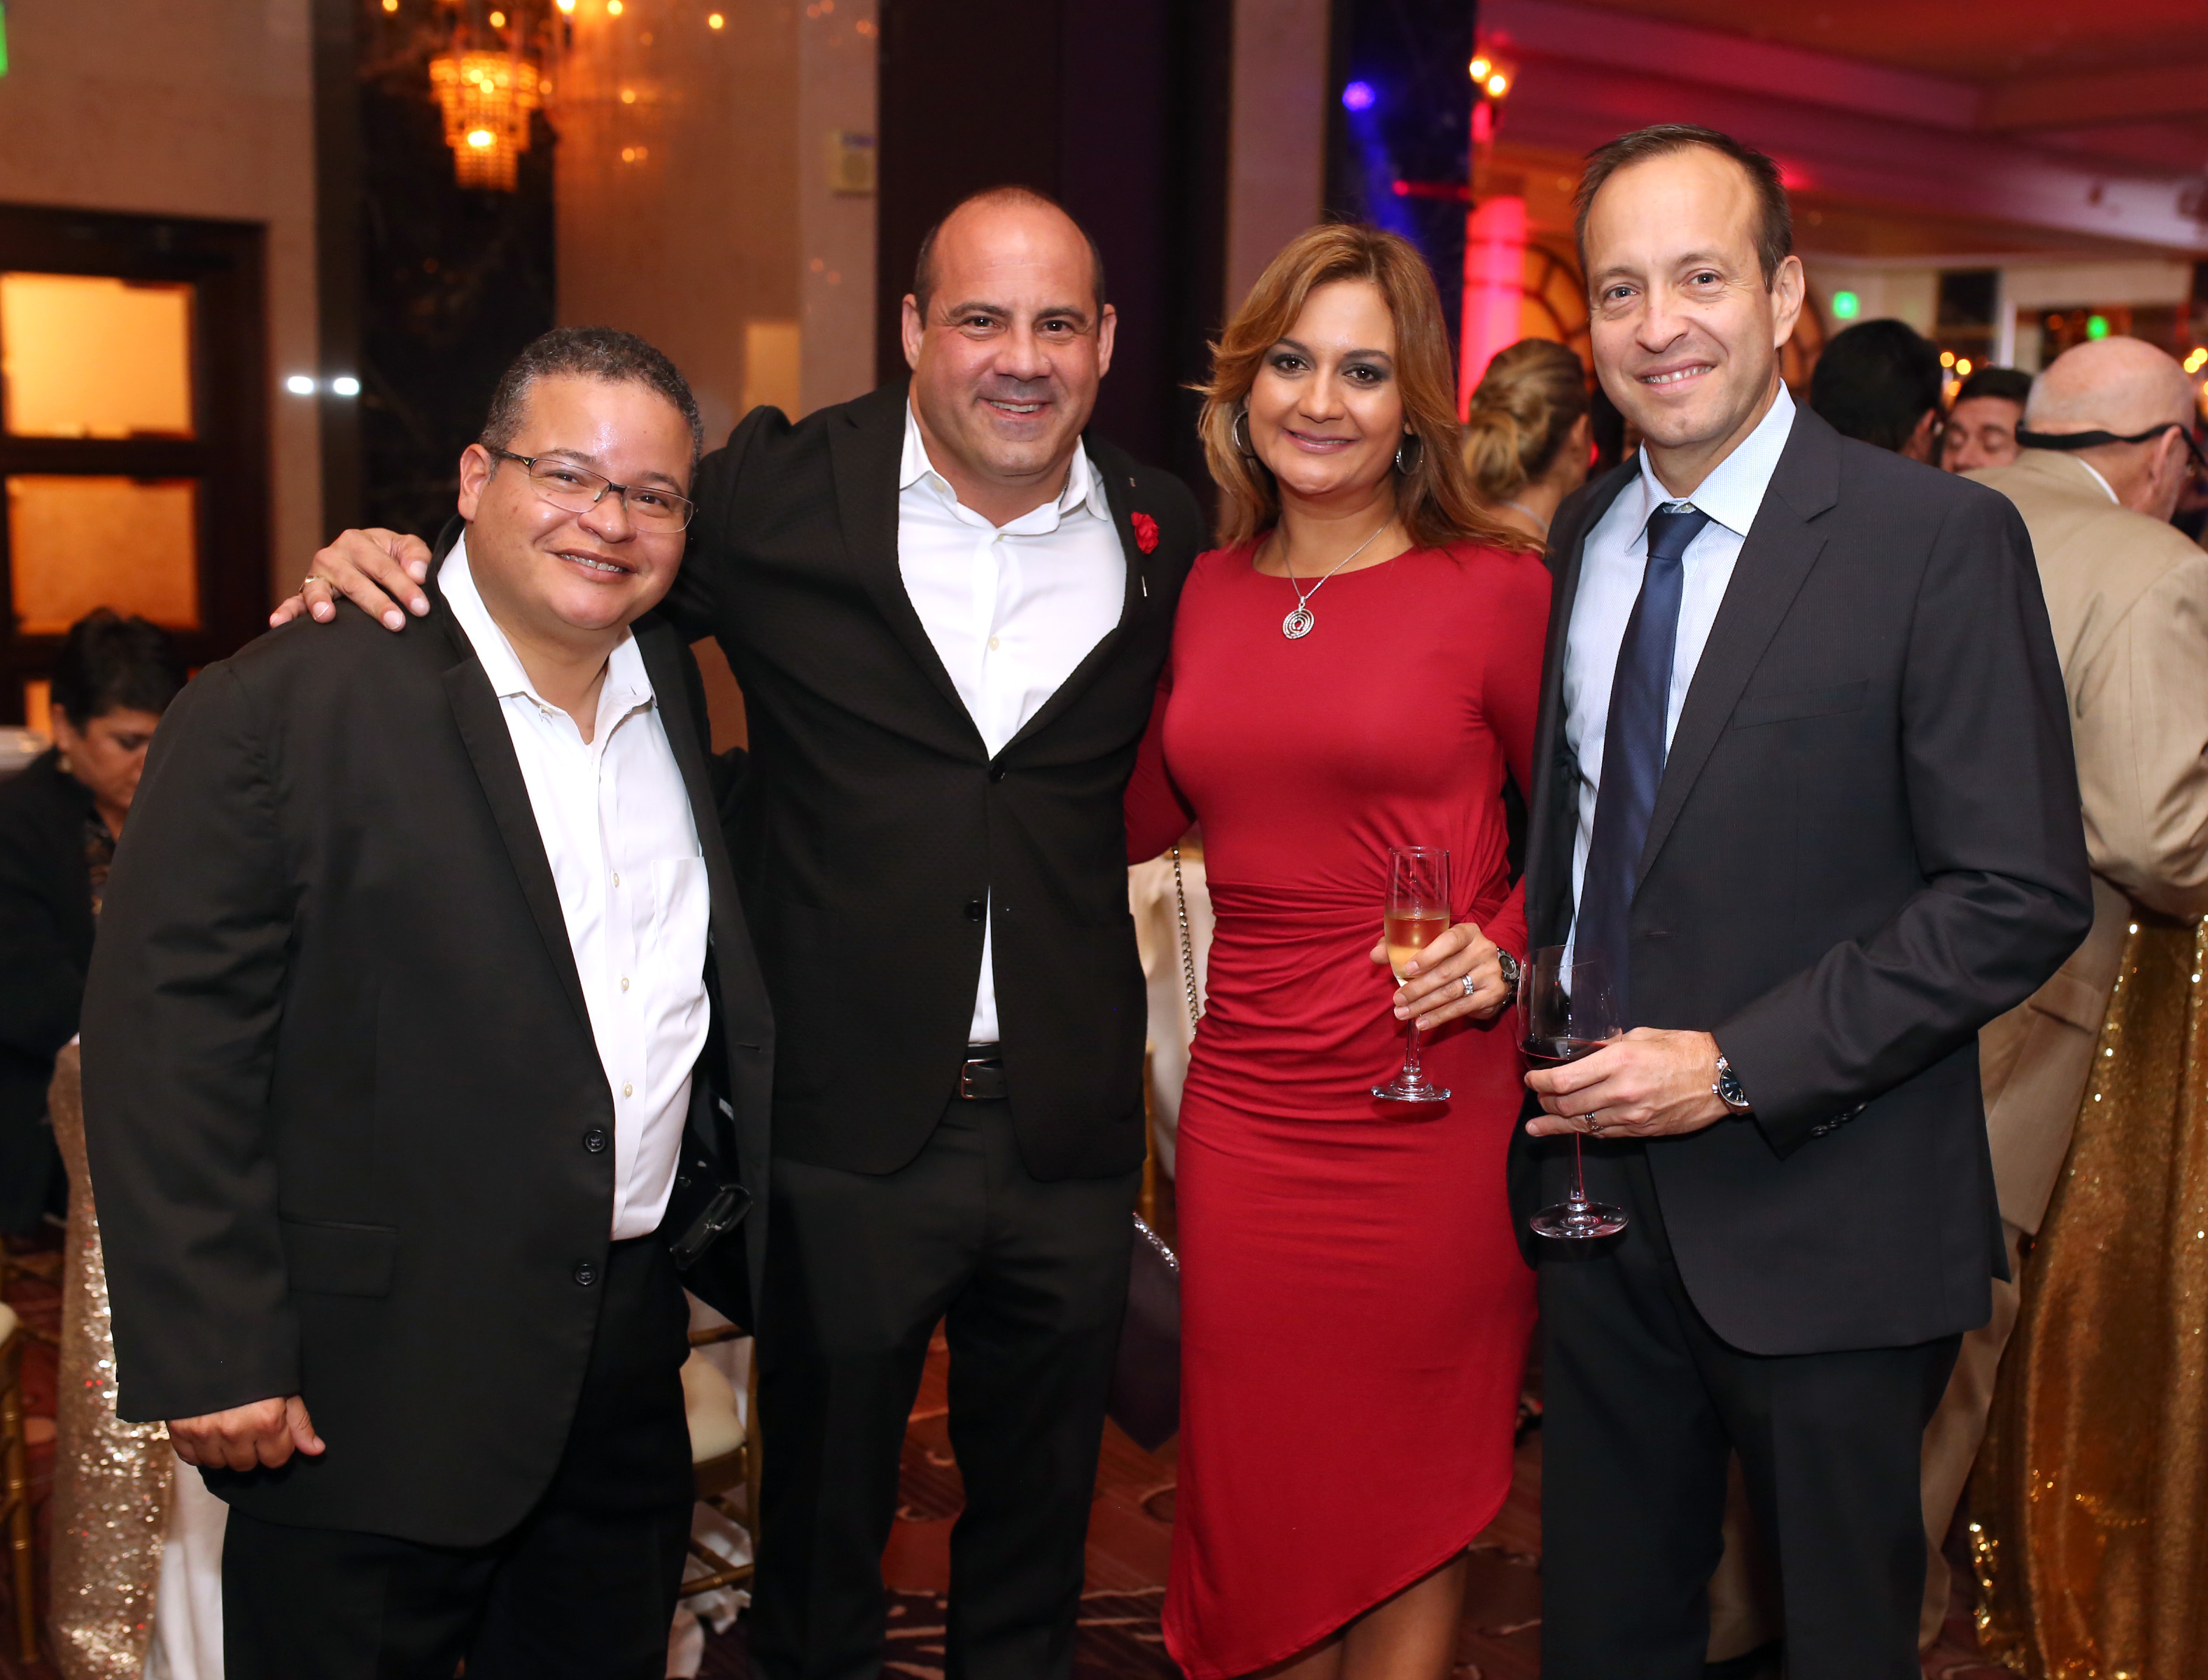 Víctor Ramos, Javier Cuevas, Michelle González, Michael Hernández. Foto: José R. Pérez Centeno.